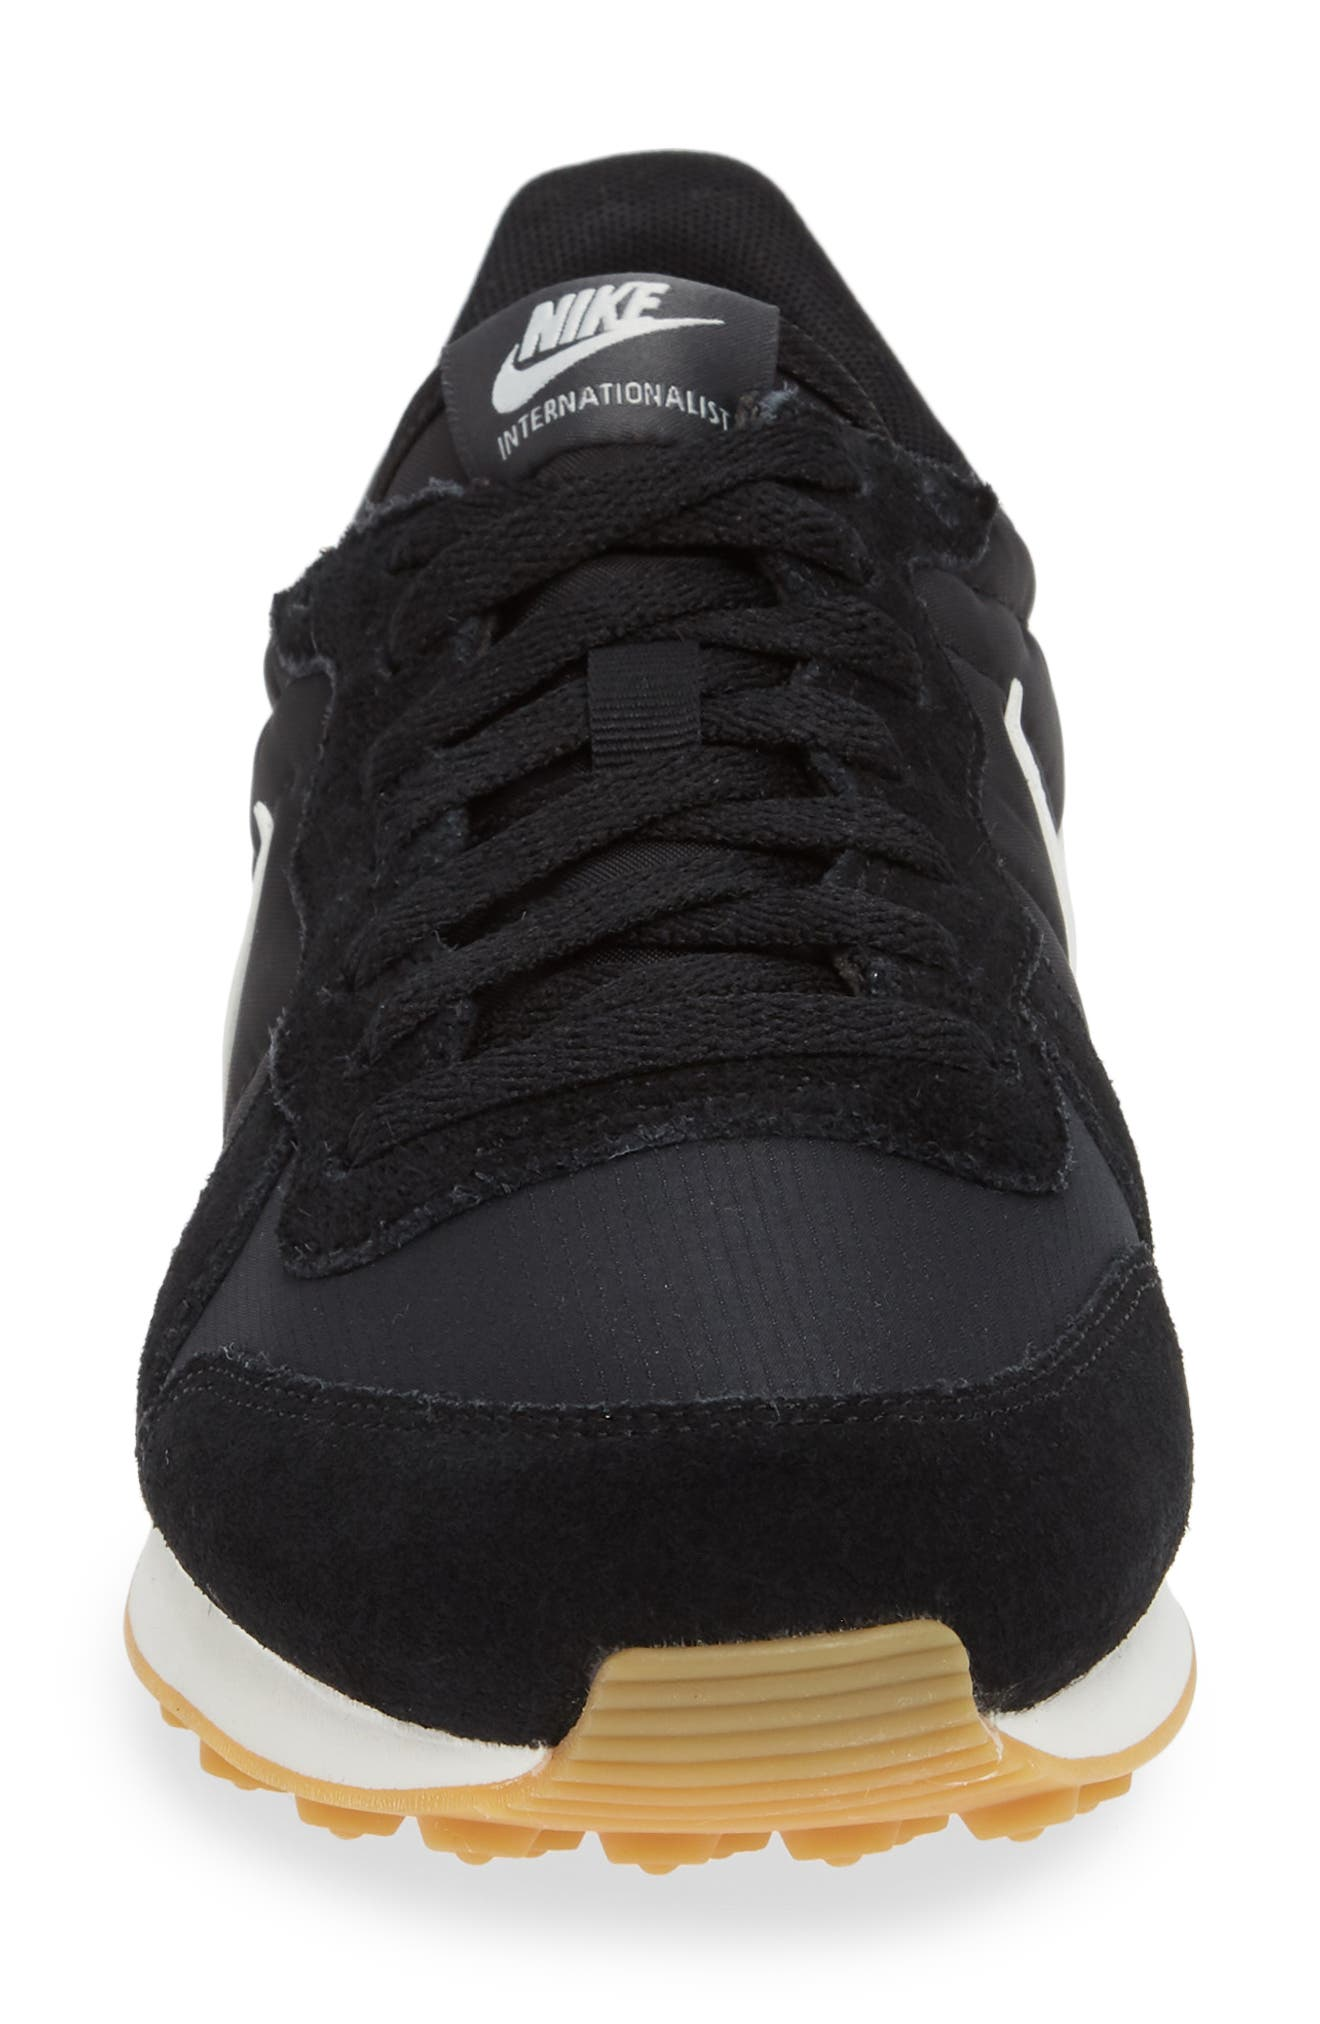 NIKE, 'Internationalist' Sneaker, Alternate thumbnail 4, color, 001